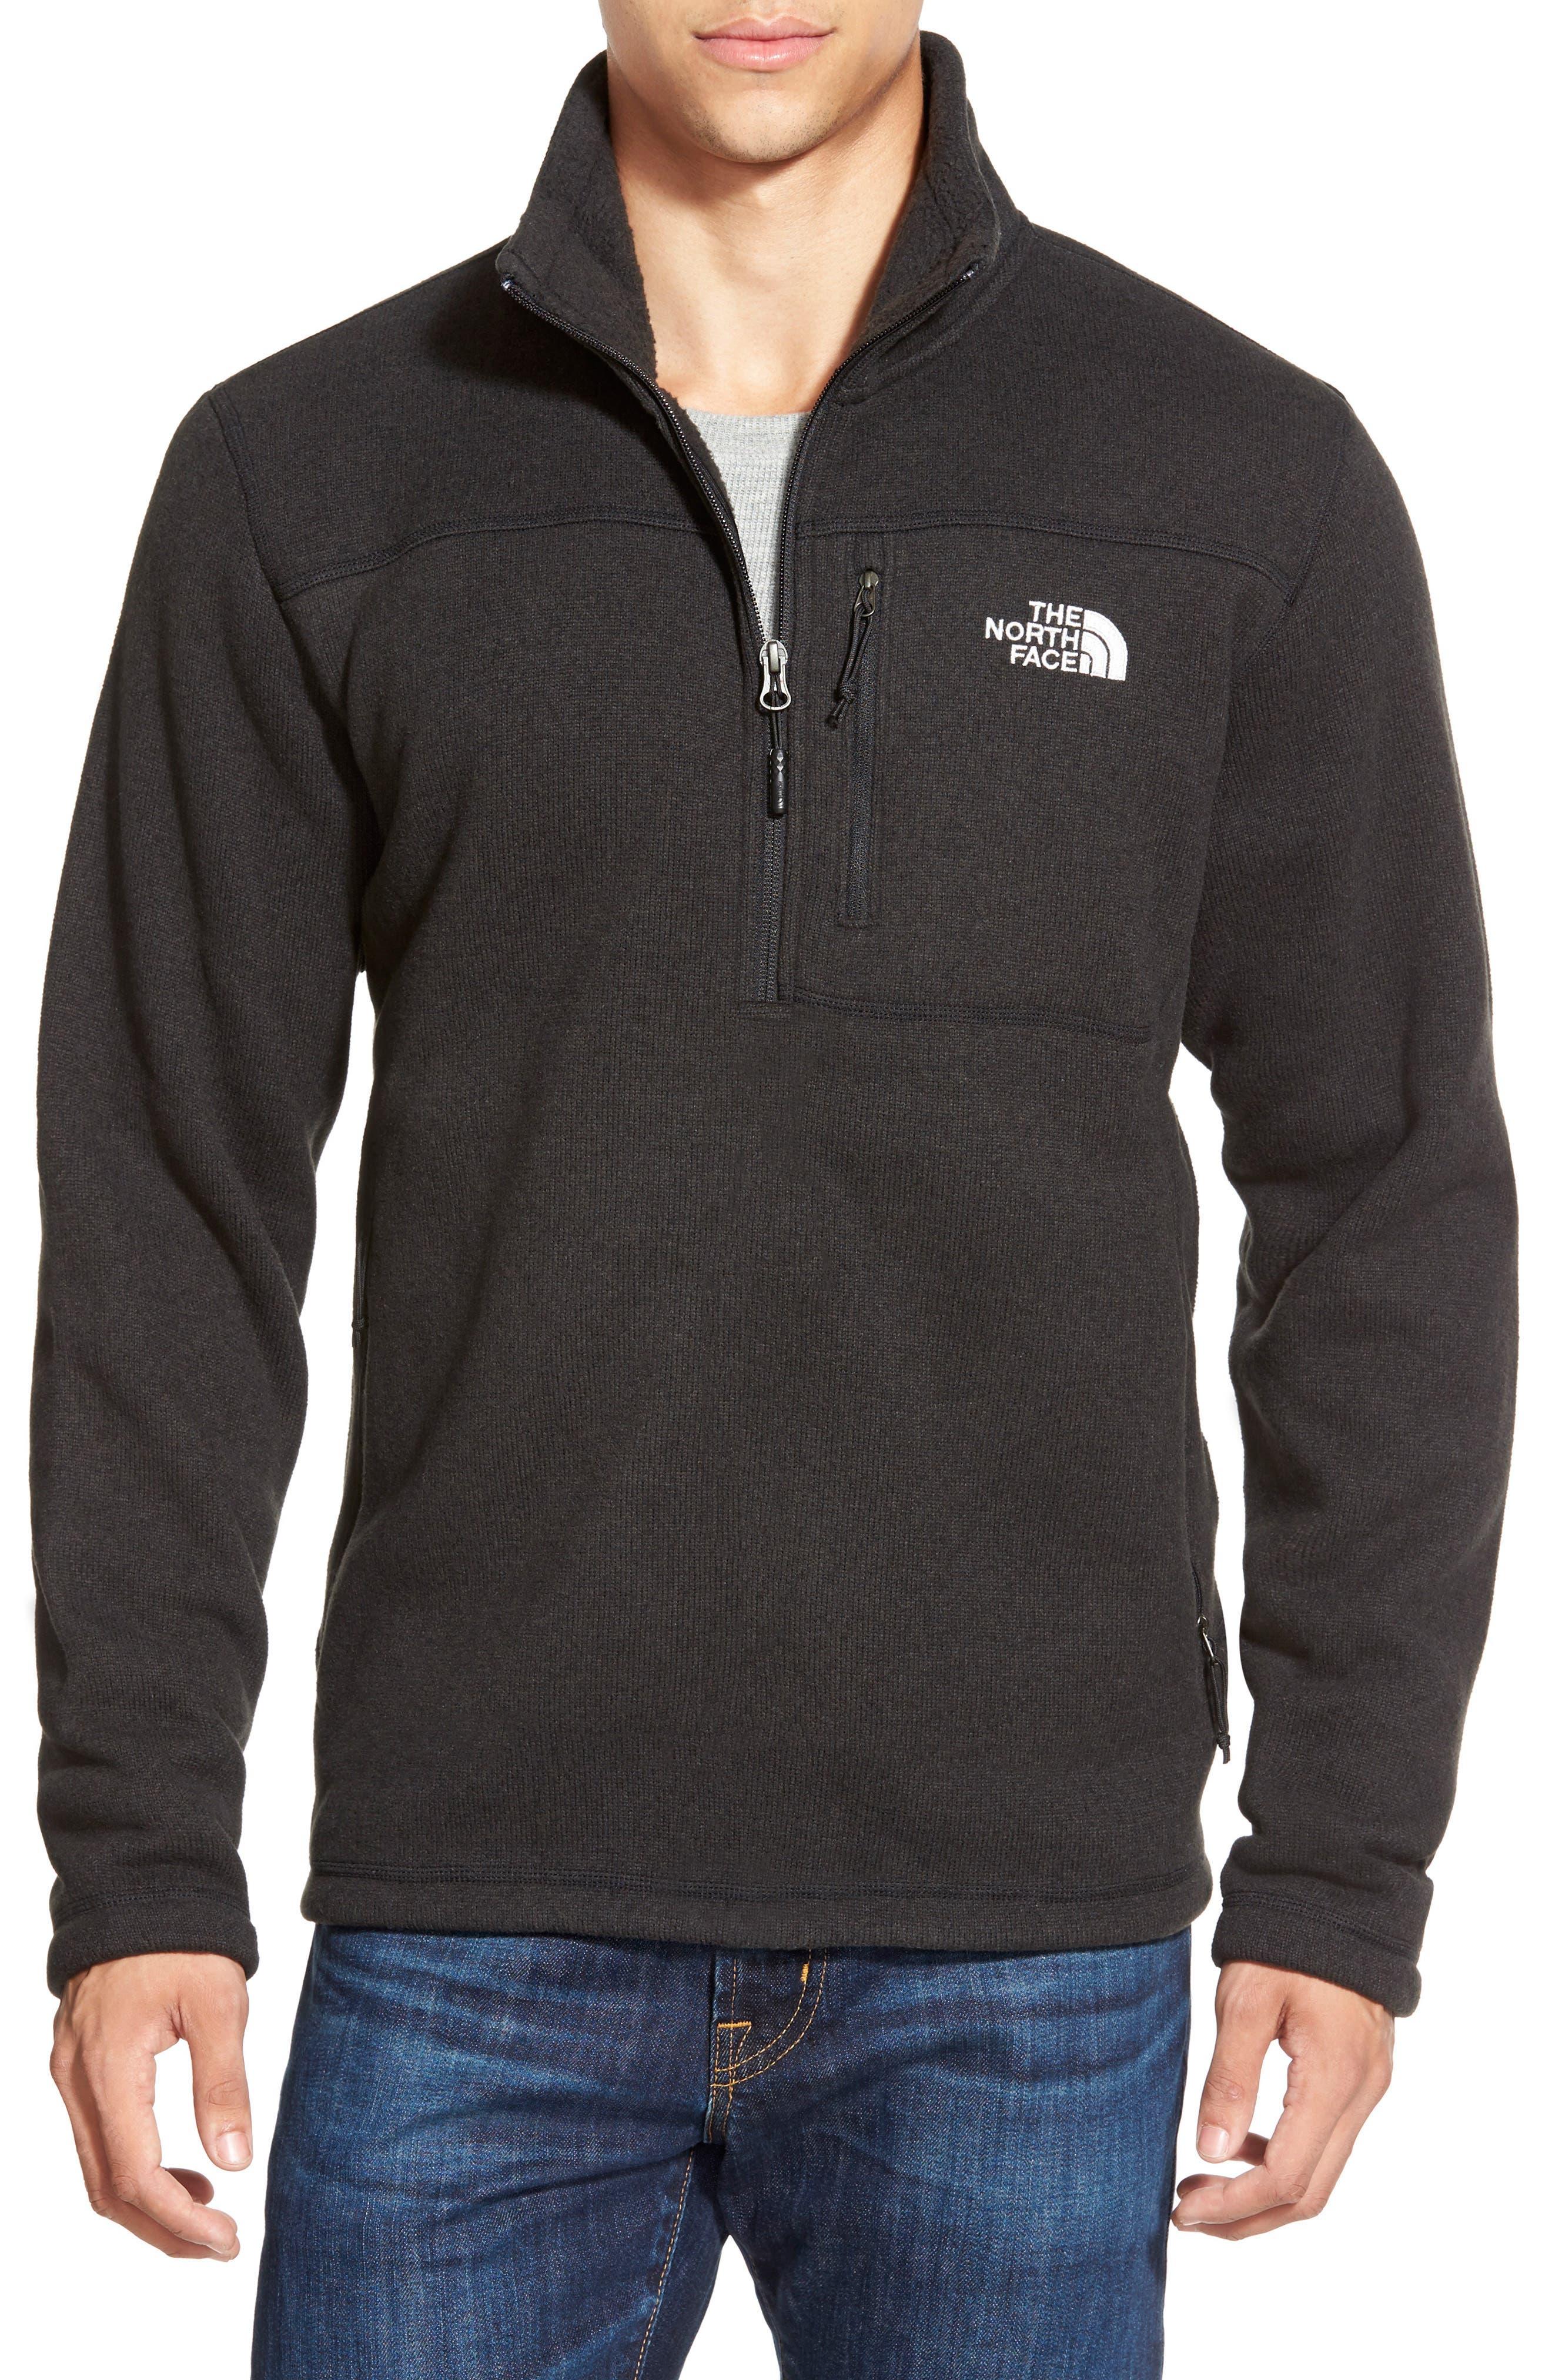 THE NORTH FACE, Gordon Lyons Quarter-Zip Fleece Jacket, Alternate thumbnail 7, color, 001